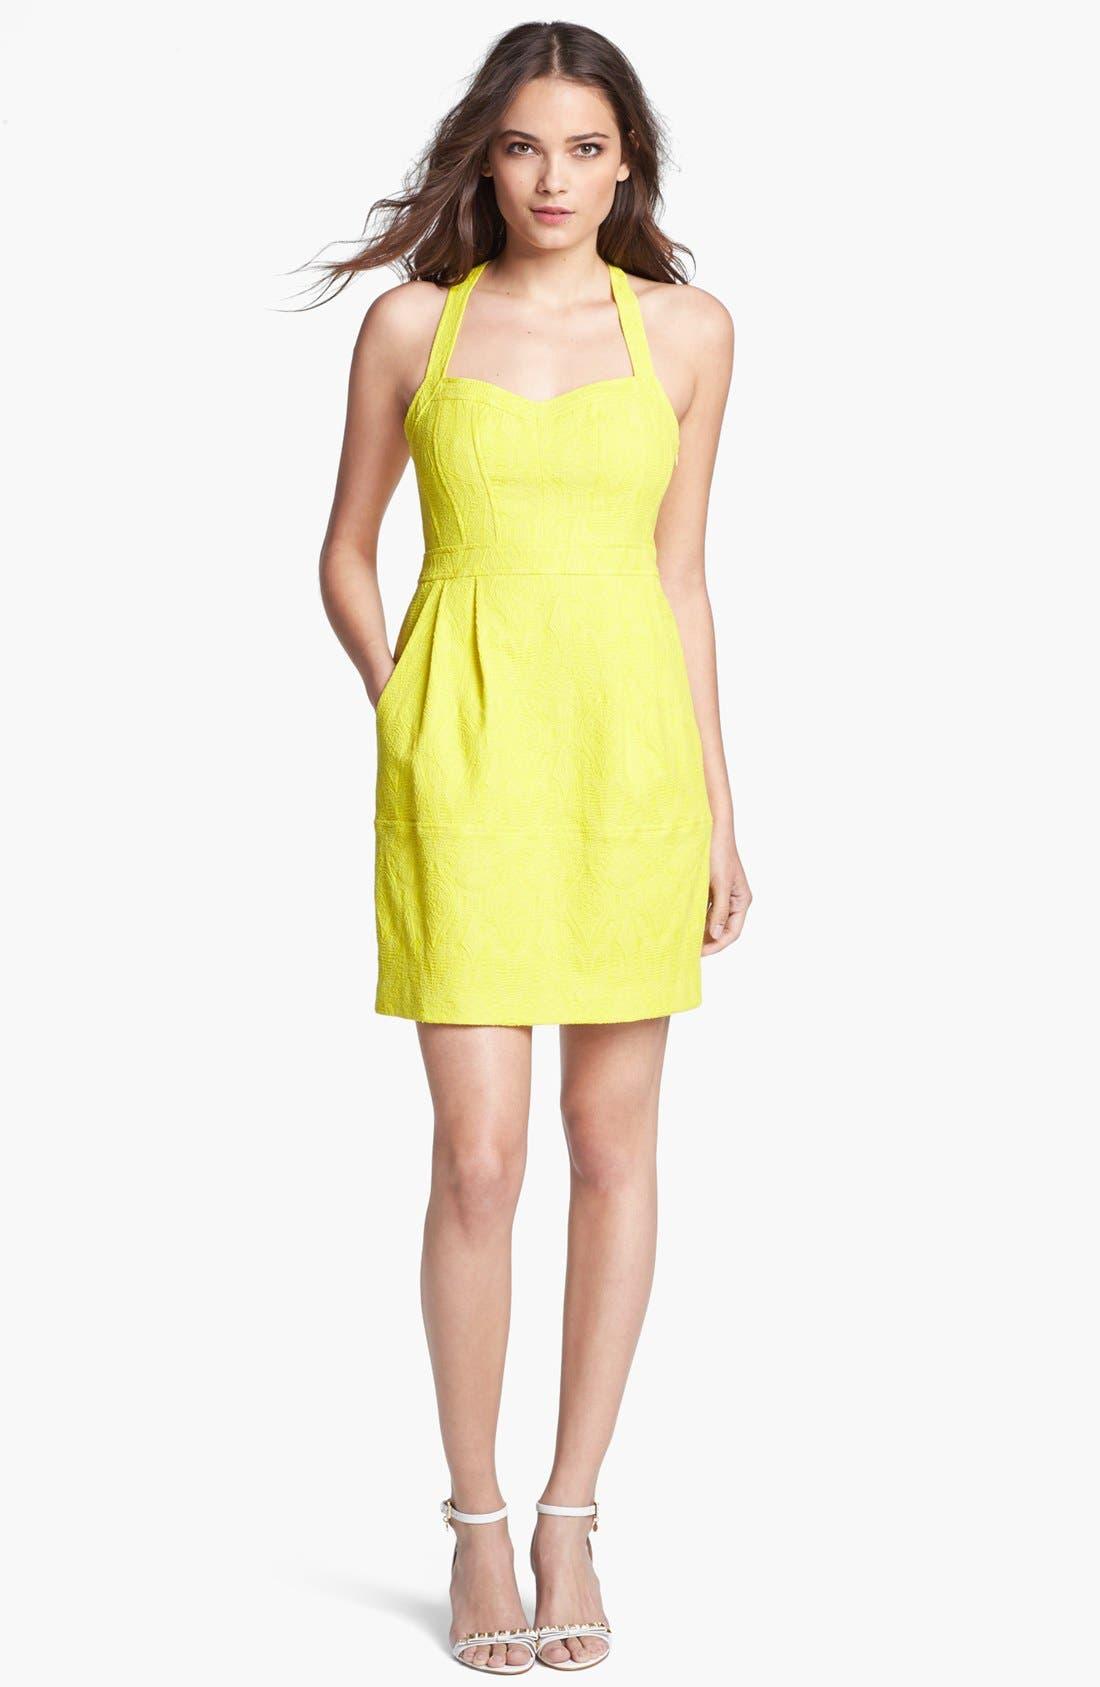 Alternate Image 1 Selected - Nanette Lepore 'Honeymoon' Cotton Blend A-Line Dress